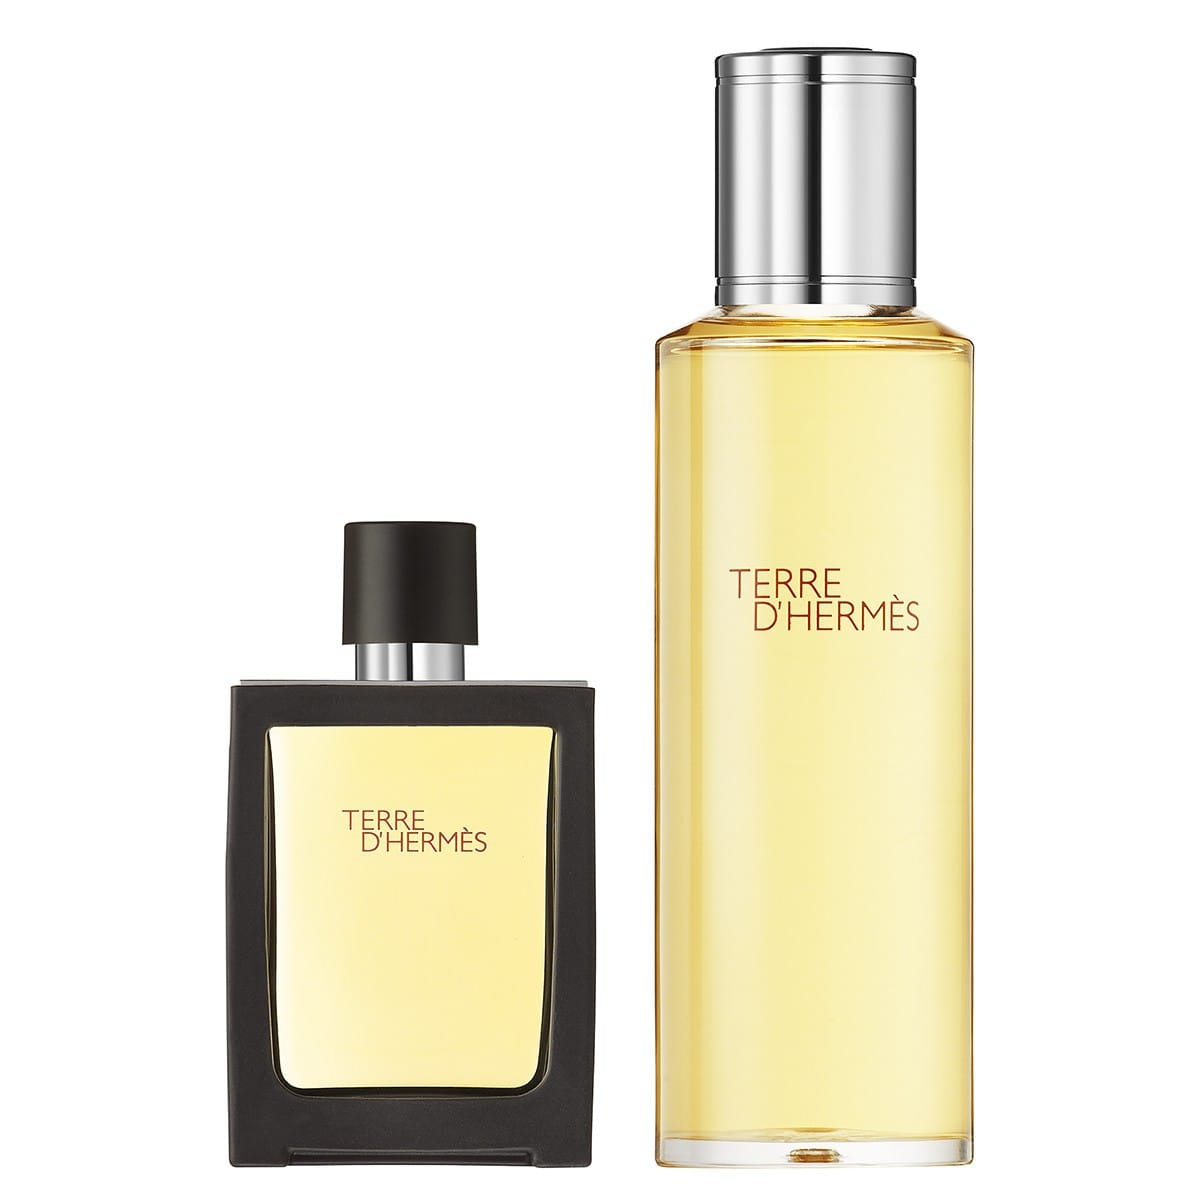 terre d 39 herm s de herm s parfum vaporisateur 30 ml recharge 125 ml incenza. Black Bedroom Furniture Sets. Home Design Ideas